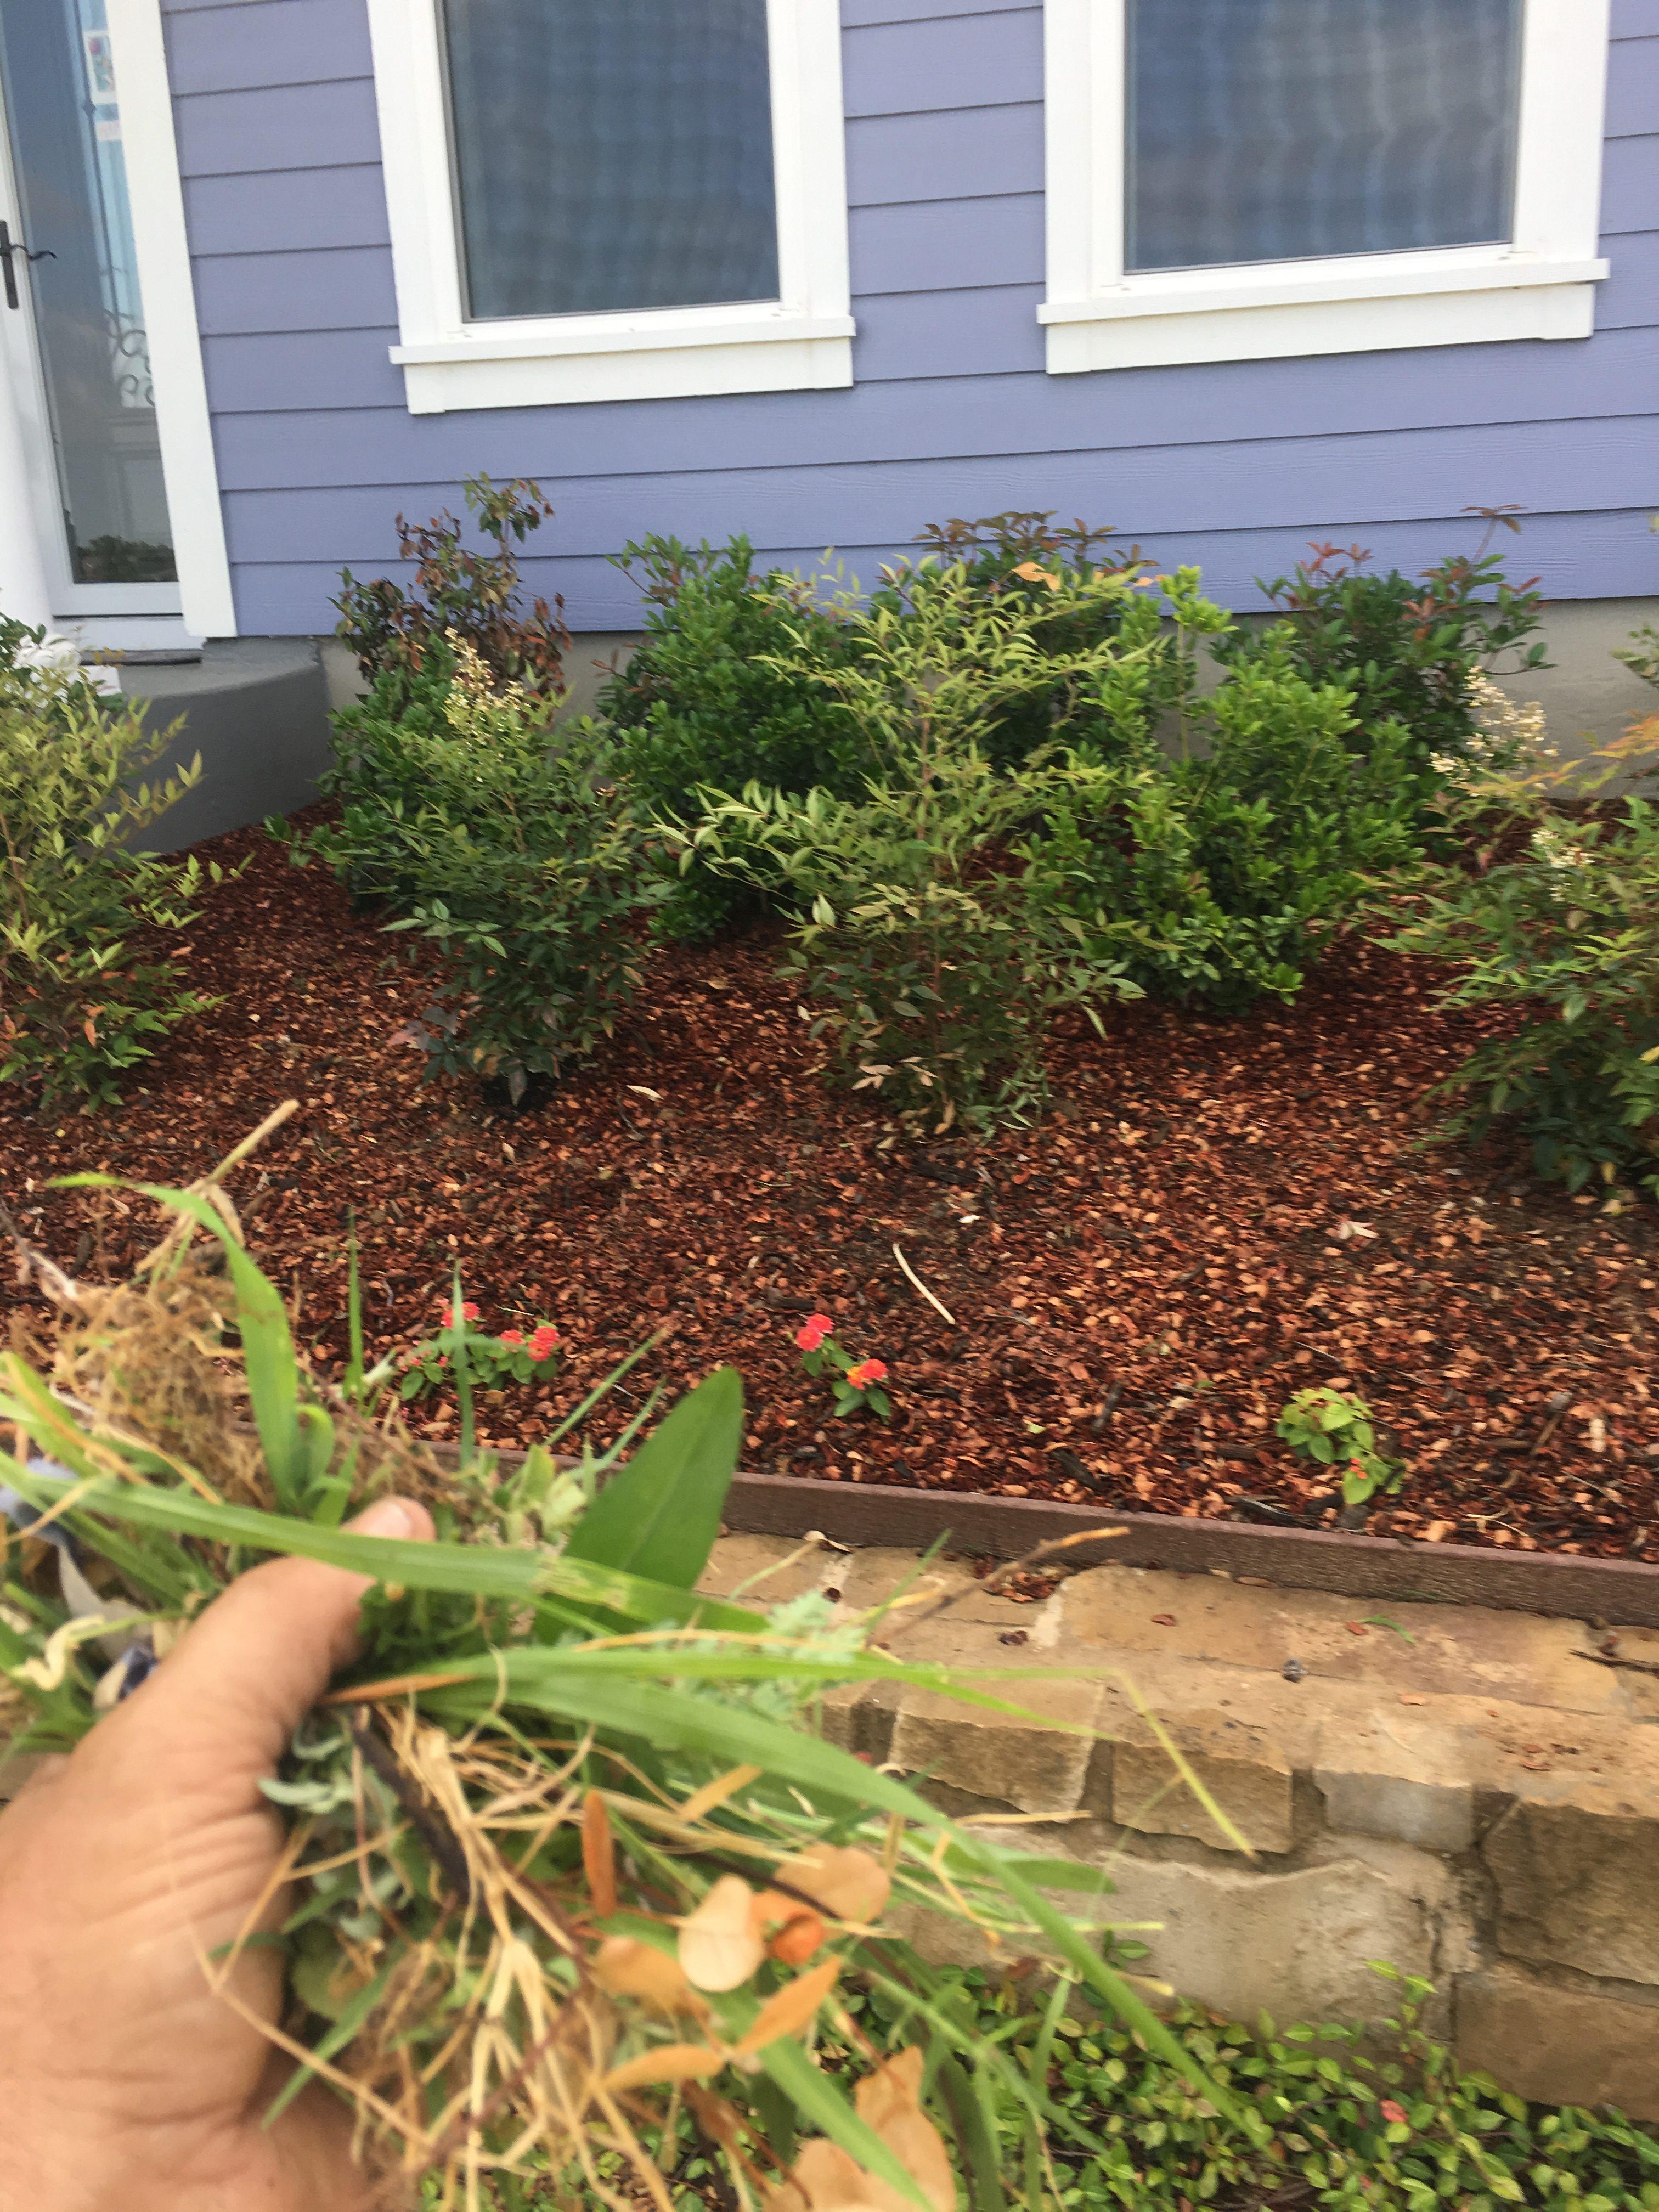 Spring weeding and mulching